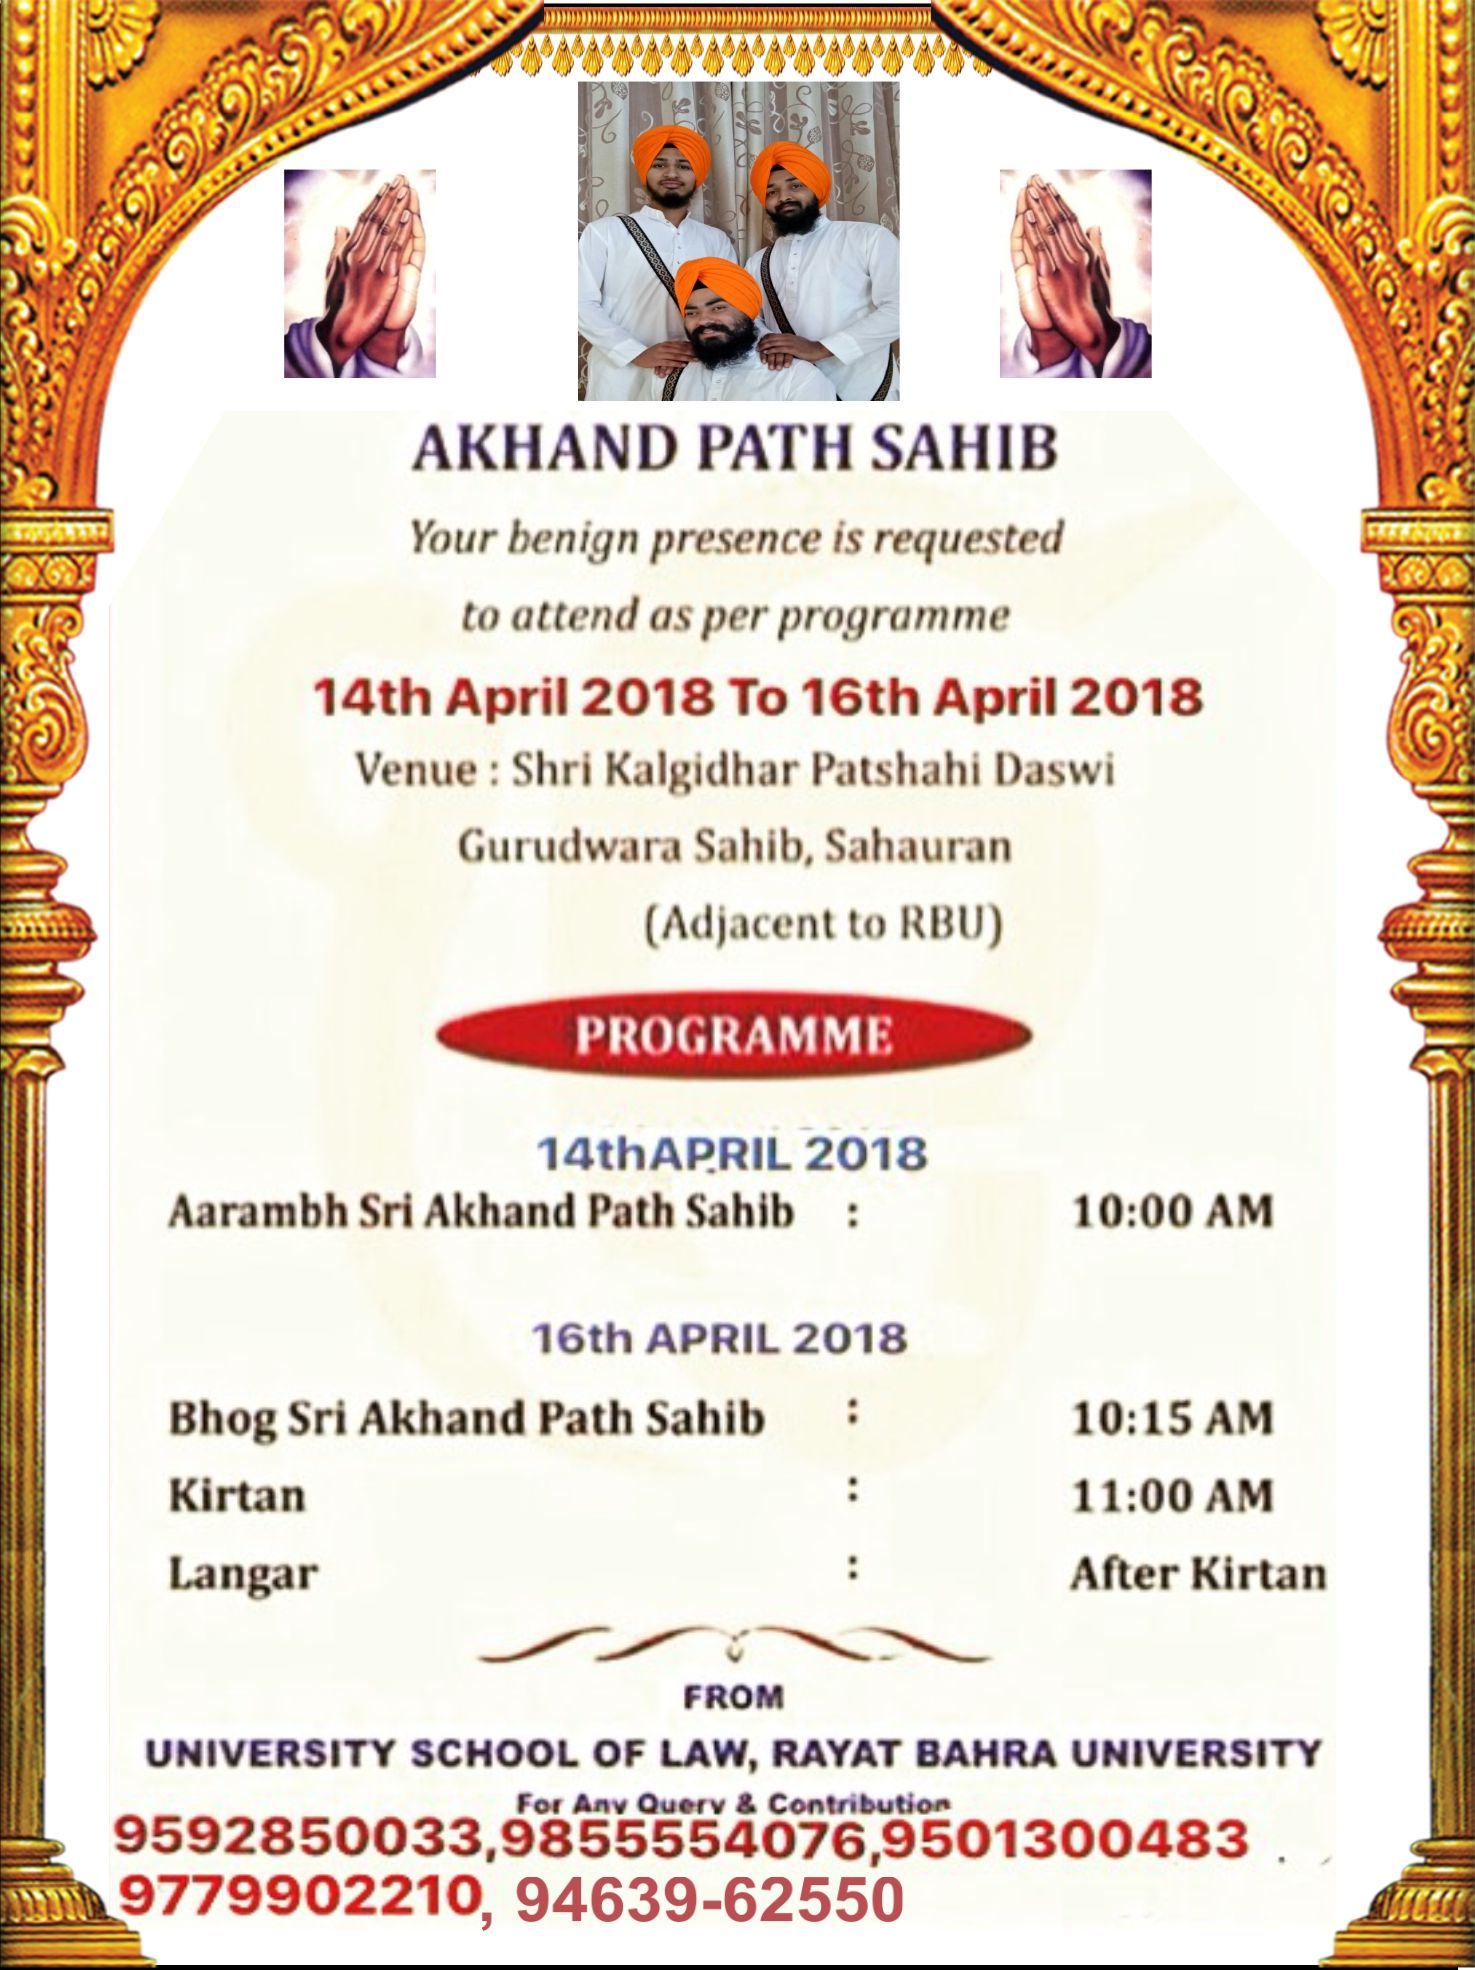 Waheguru Ji Ka Khalsa Waheguru Ji Ki Fateh Rayat Bahra University Cordially Invites You All To The Akhand Path Sahib Invitations Private University Paths